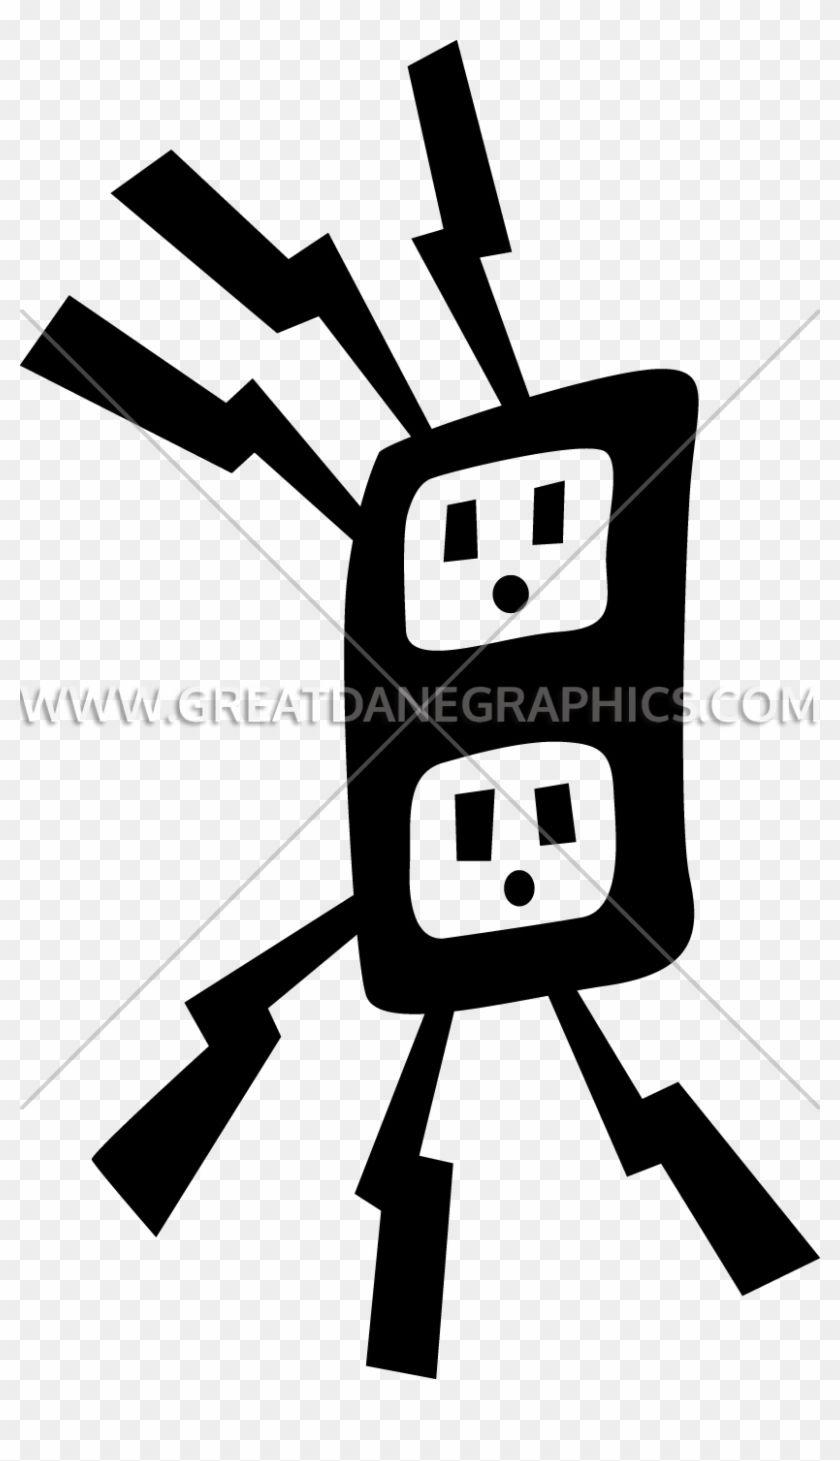 Plug Clipart Ideas In 2021 Clip Art Plugs Free Clipart Downloads